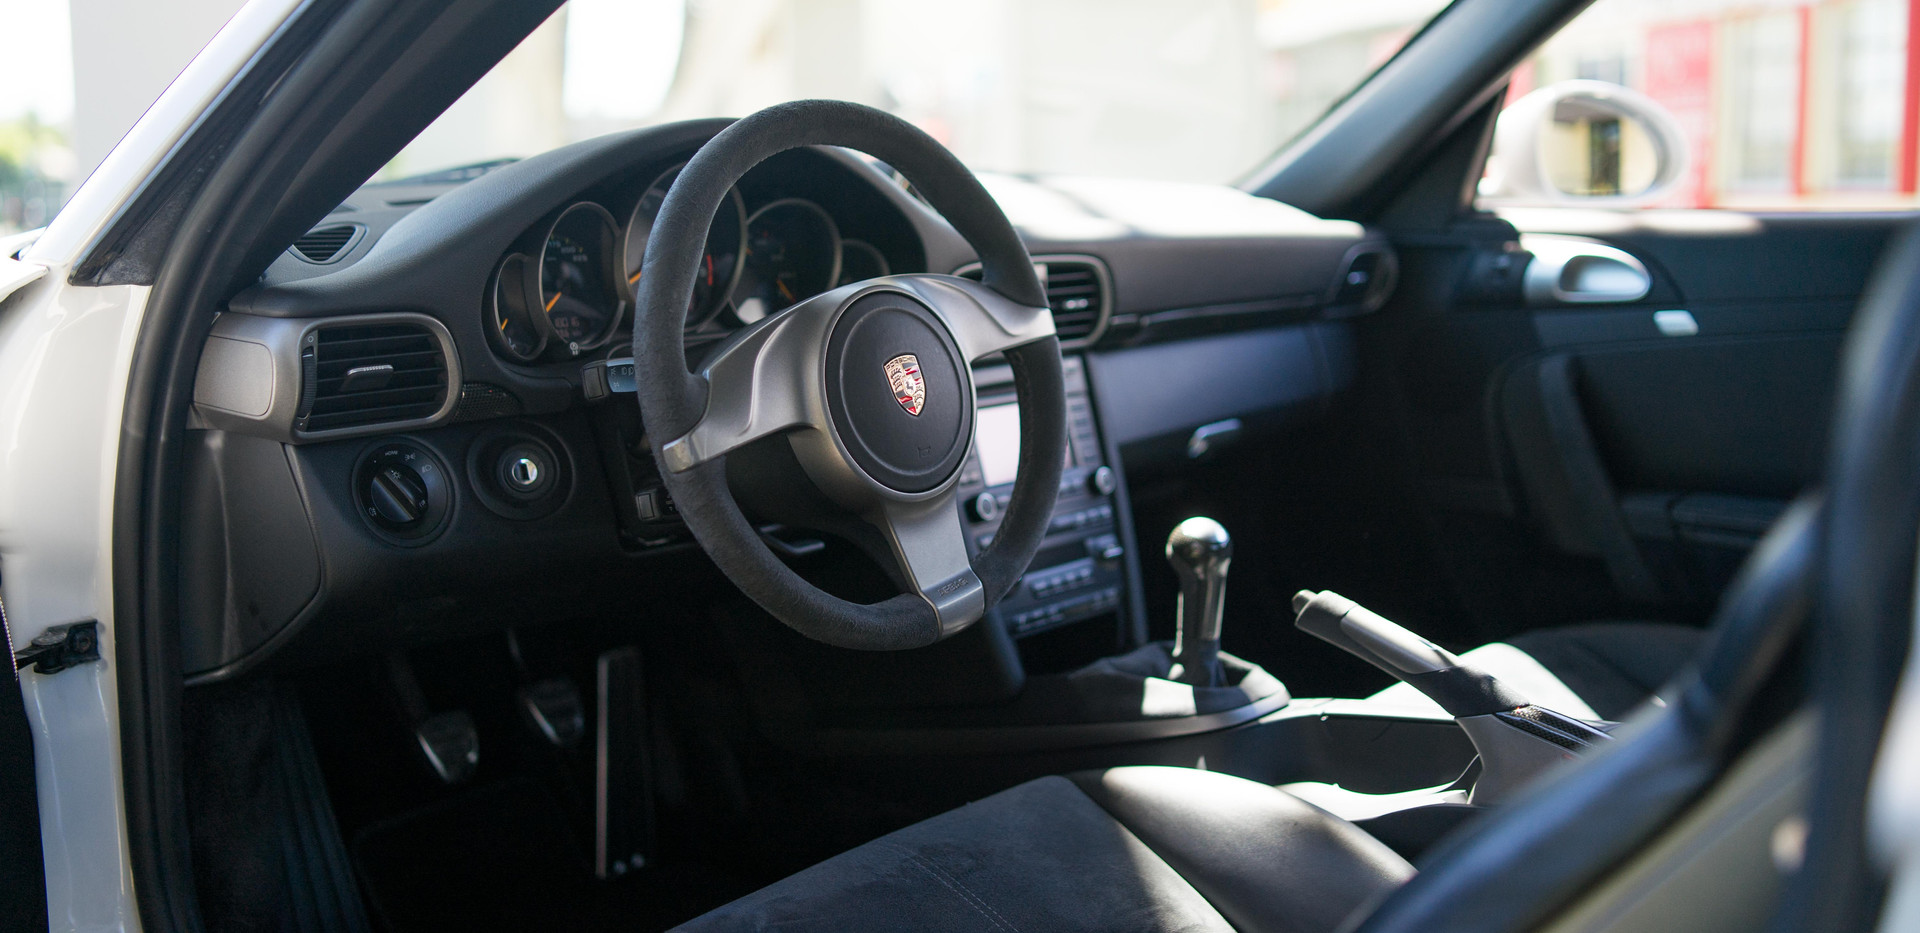 997.2 GT3